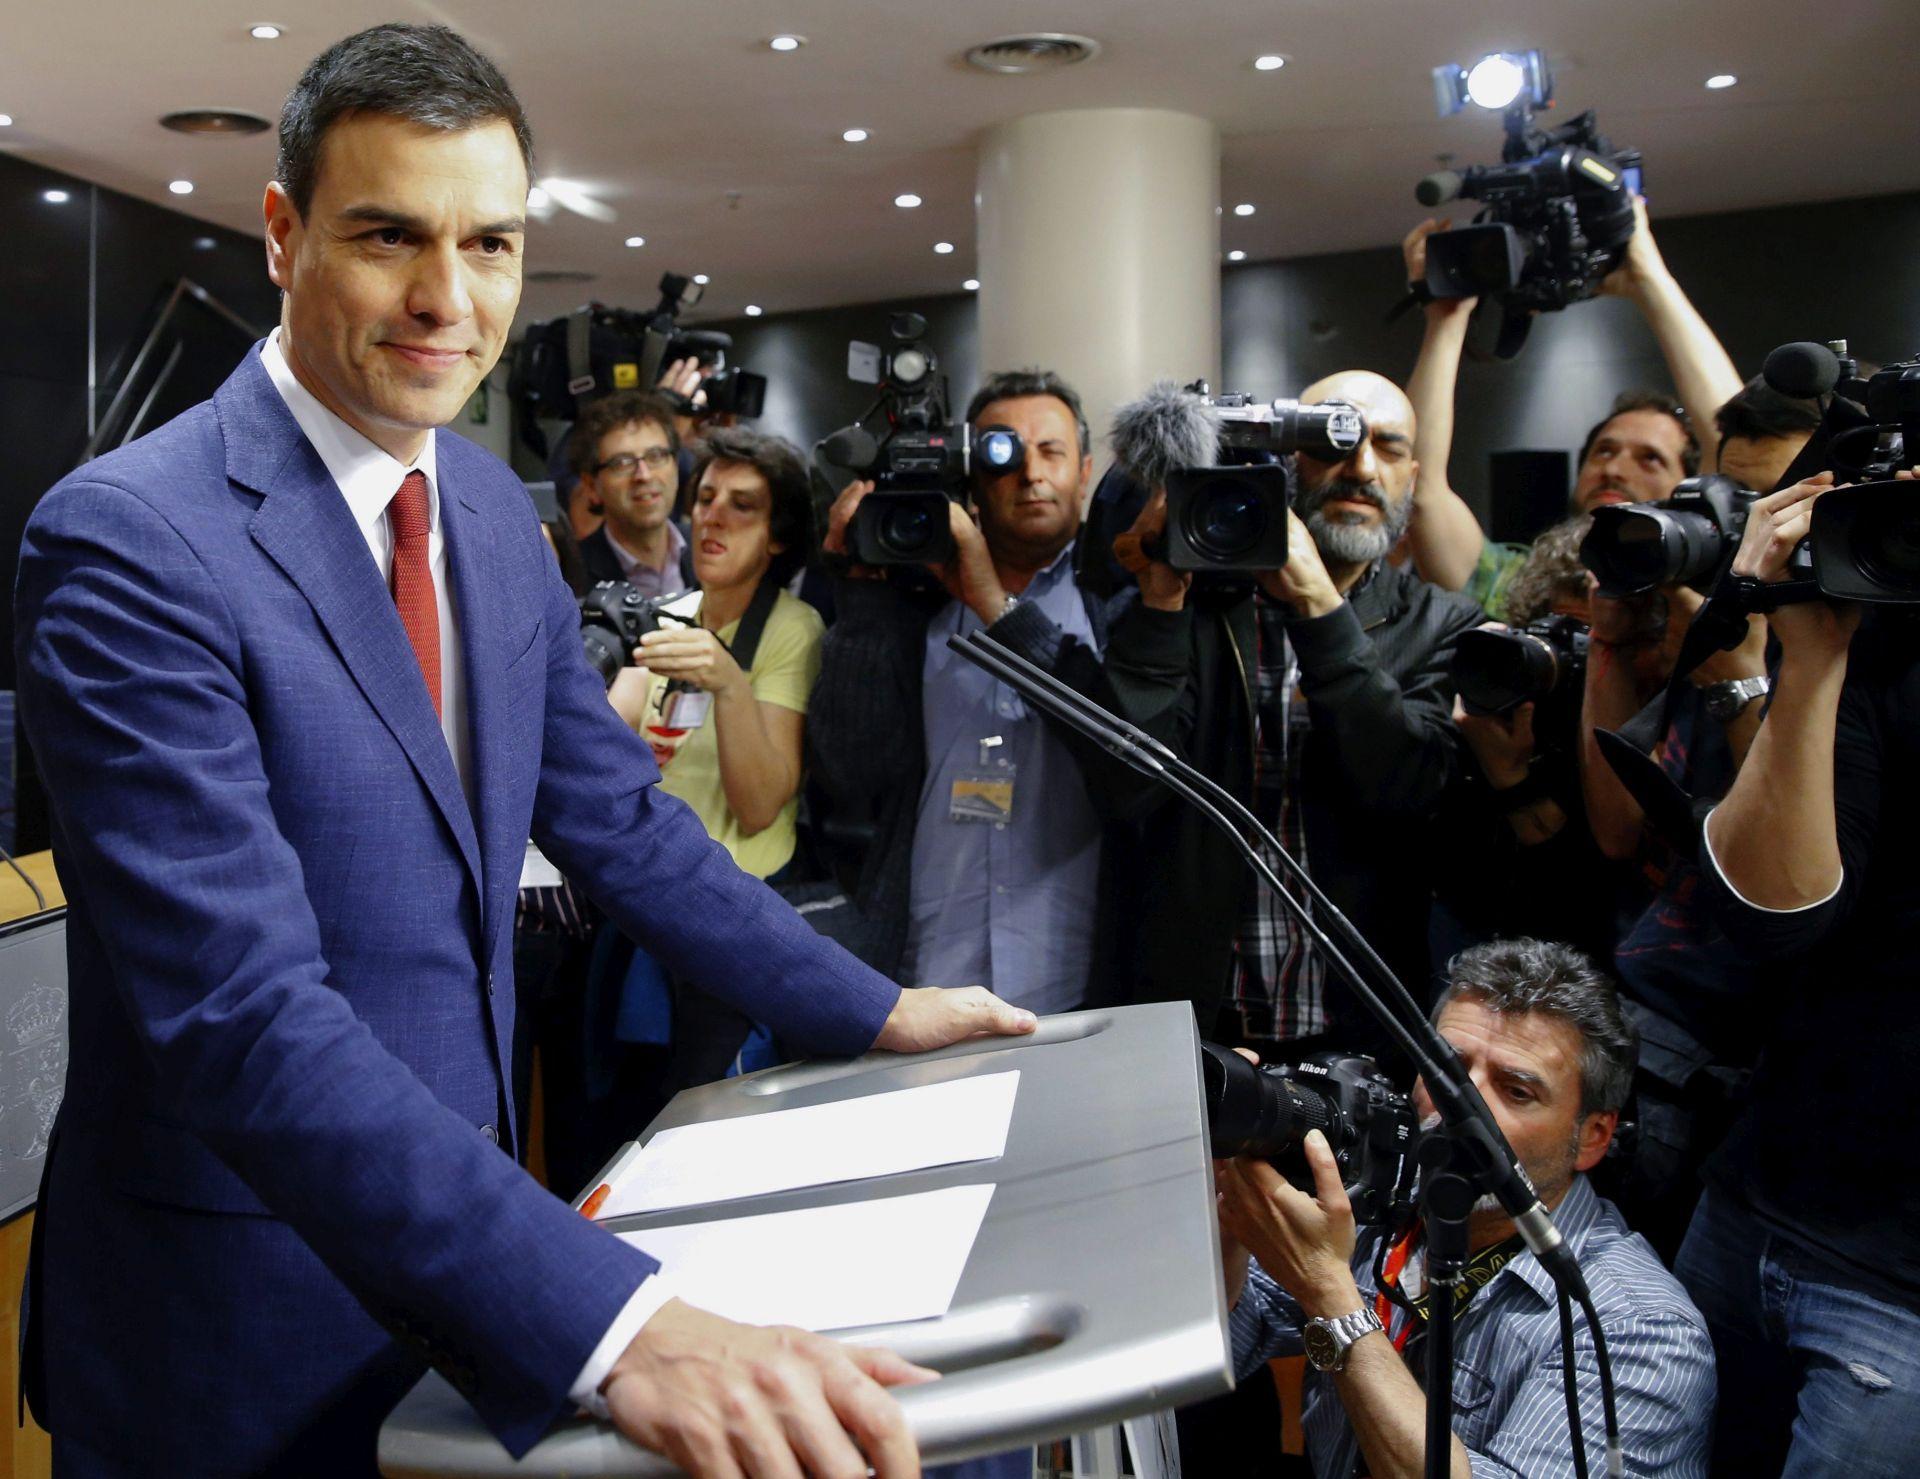 Španjolska: Propali pregovori, socijalisti drže da su izbori neizbježni